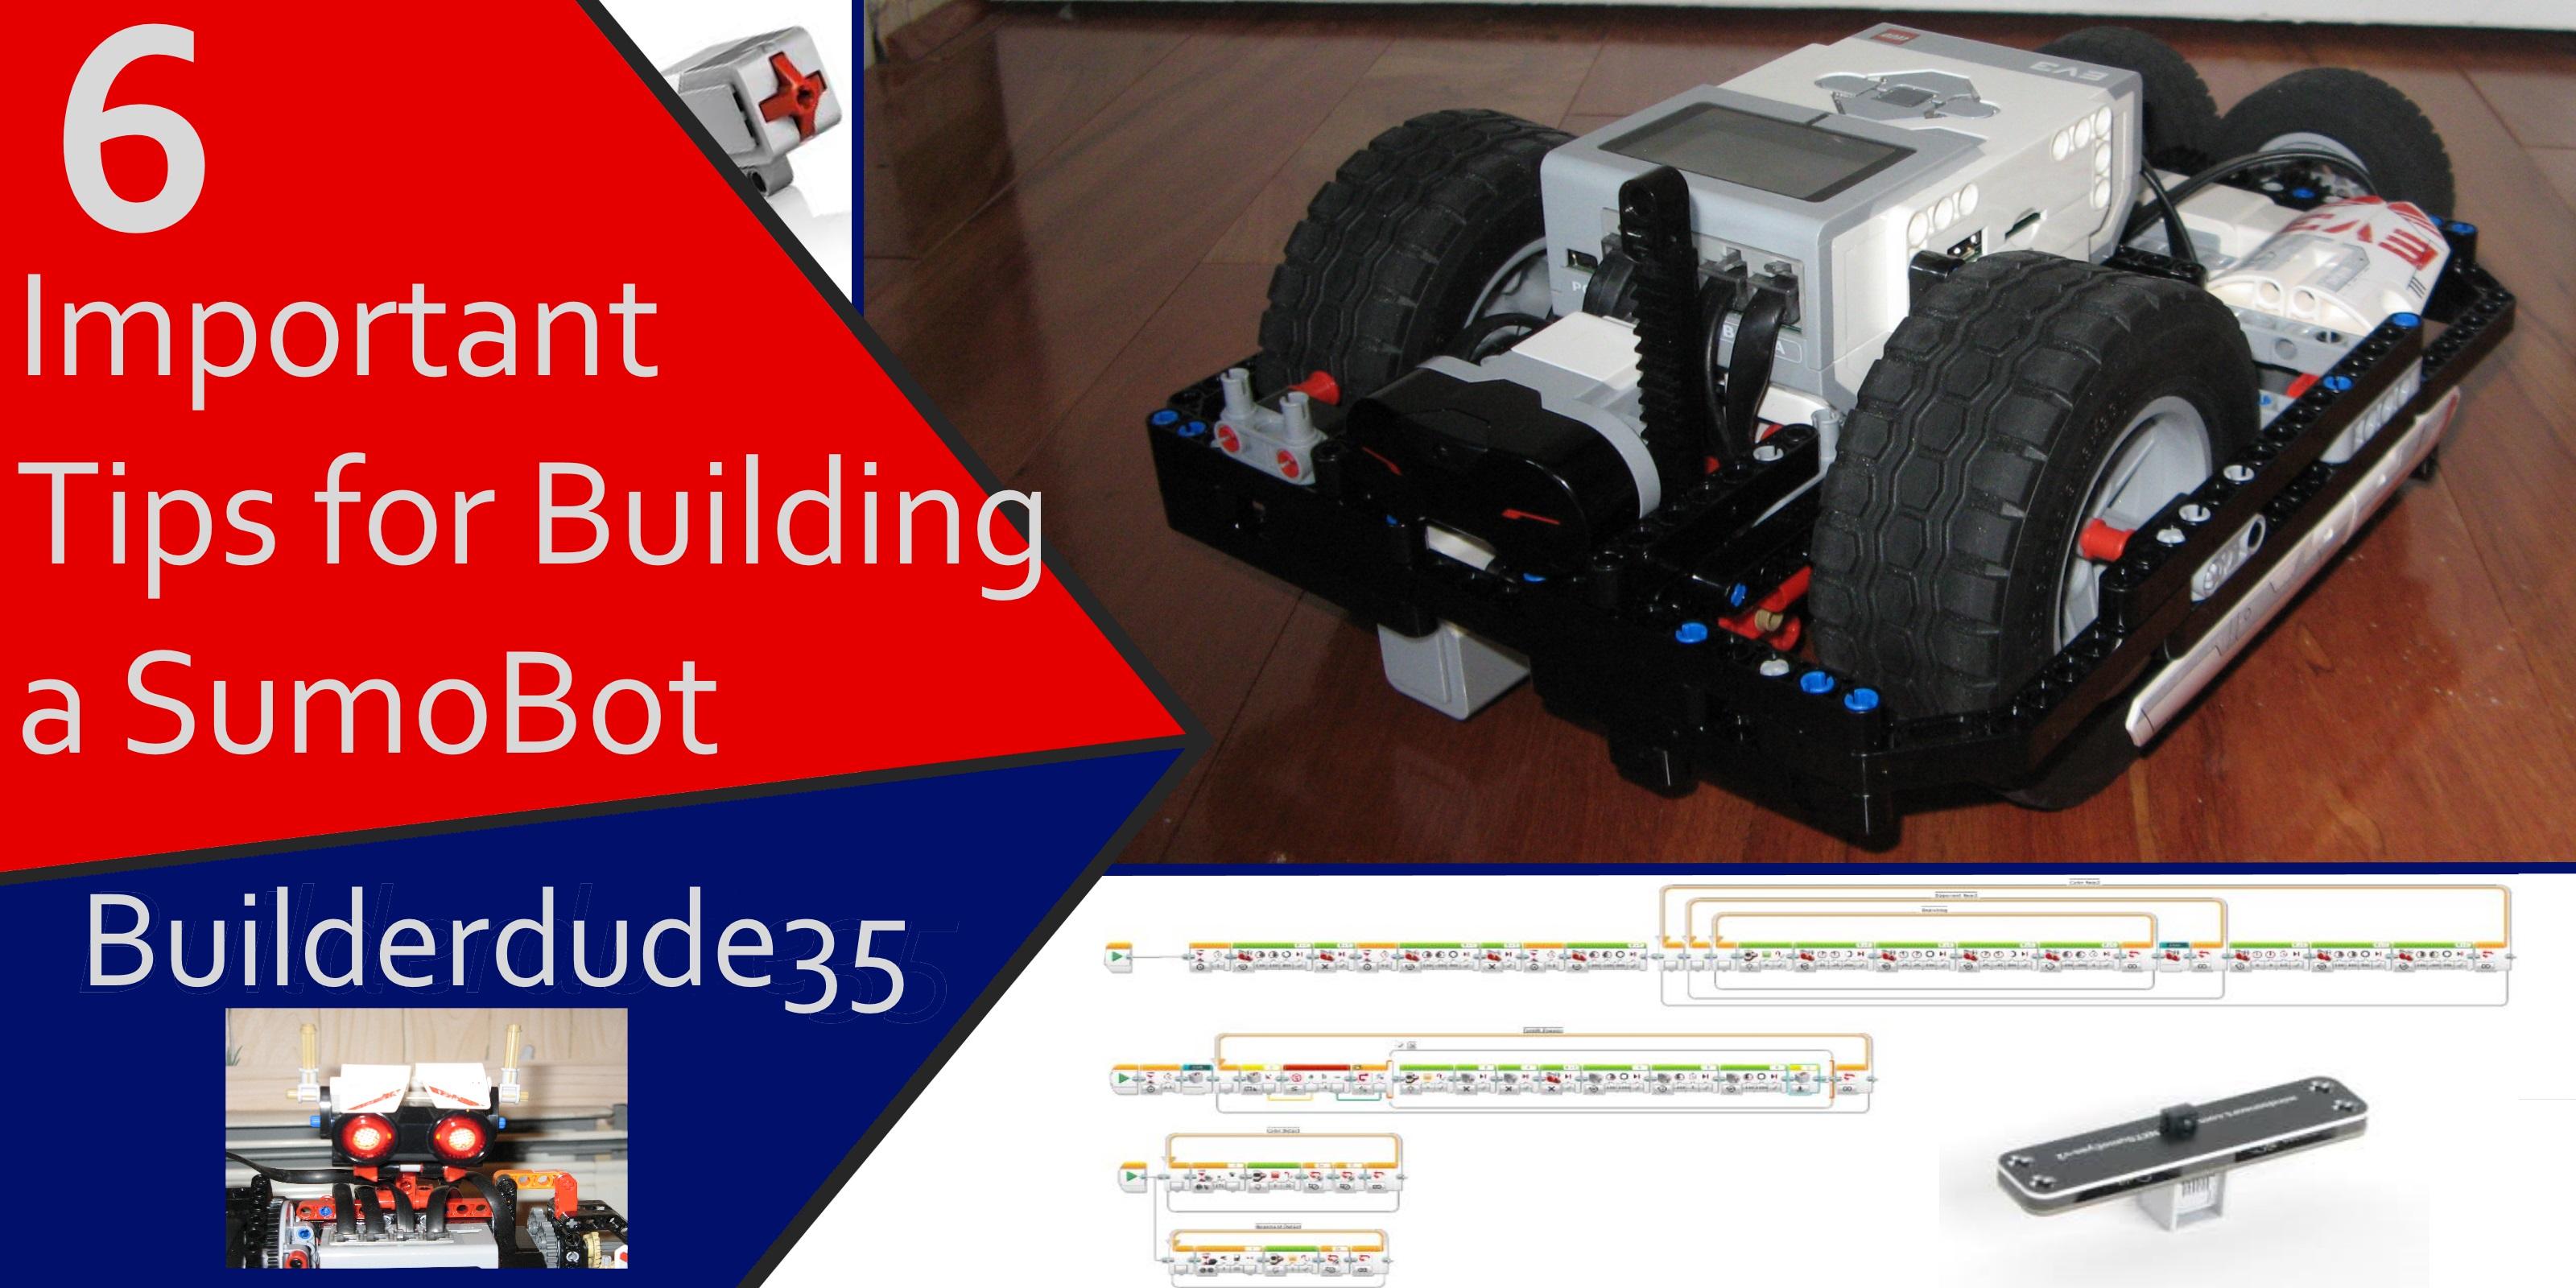 sumobot – Builderdude35